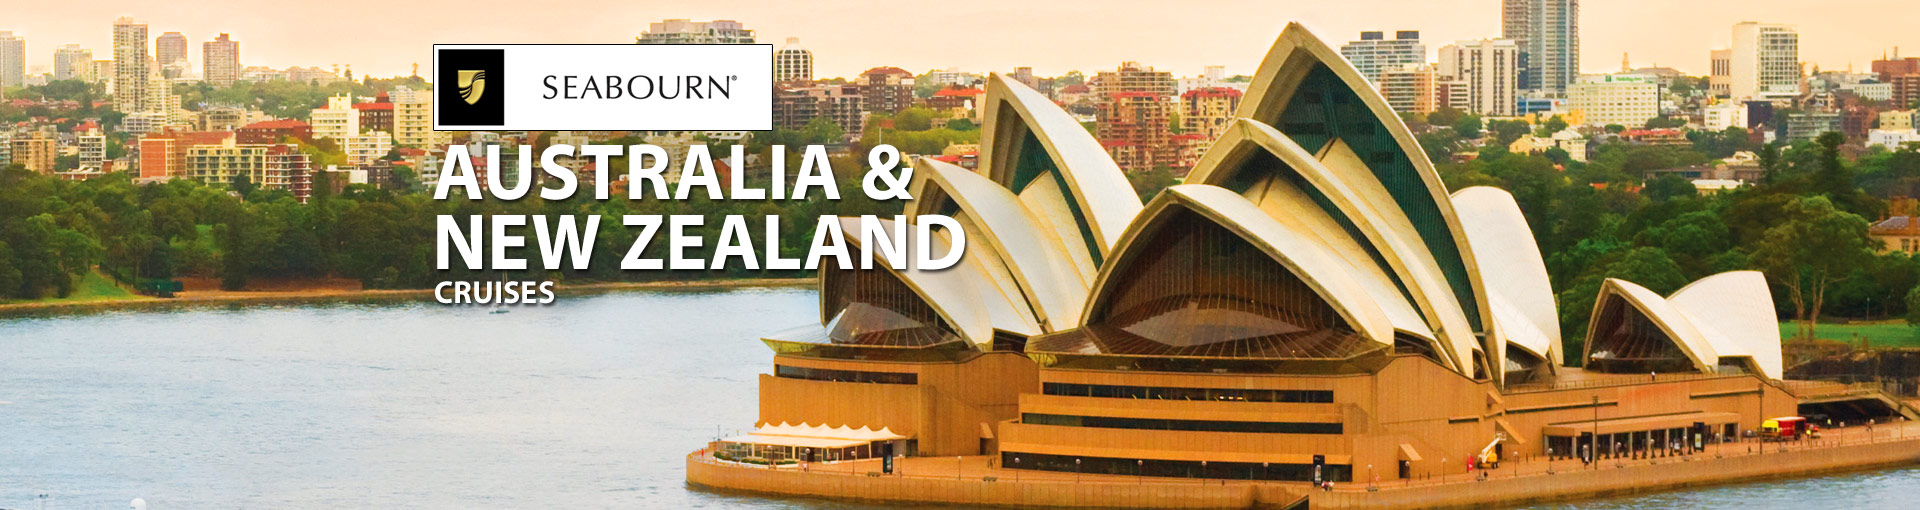 Banner image for Seabourn Australia cruises